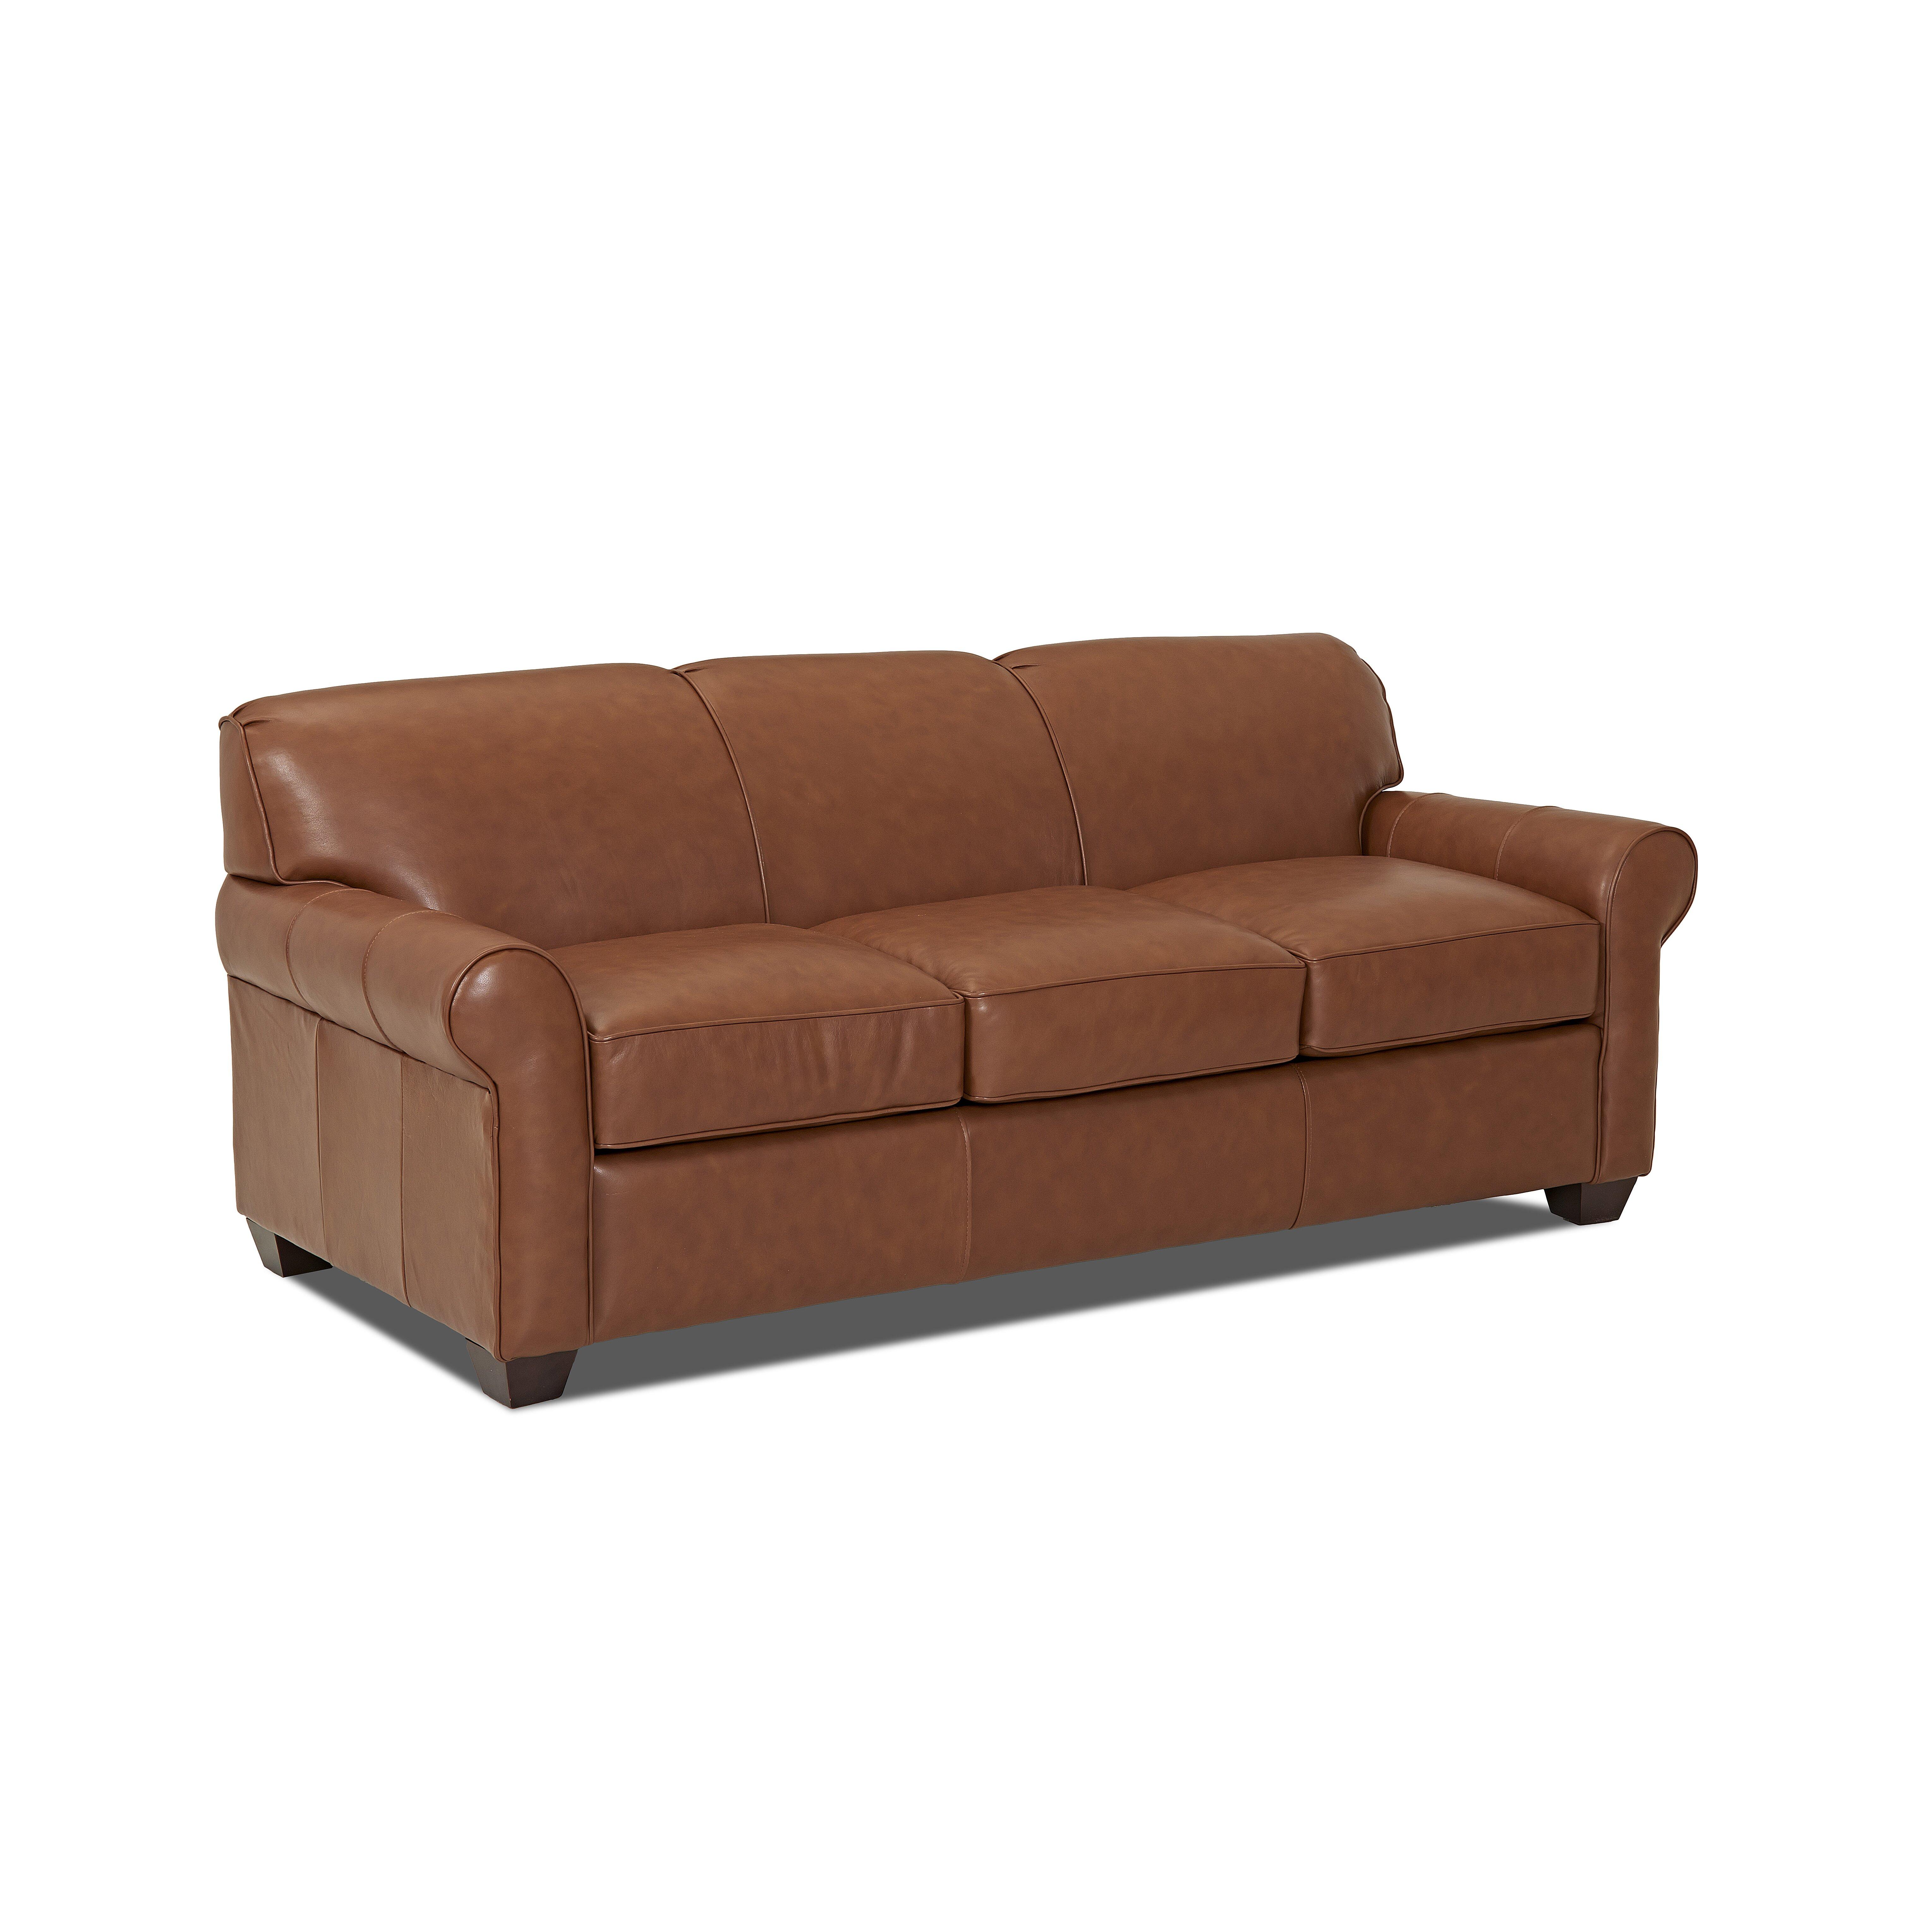 Wayfair custom upholstery jennifer leather sofa reviews for Leather sofa reviews